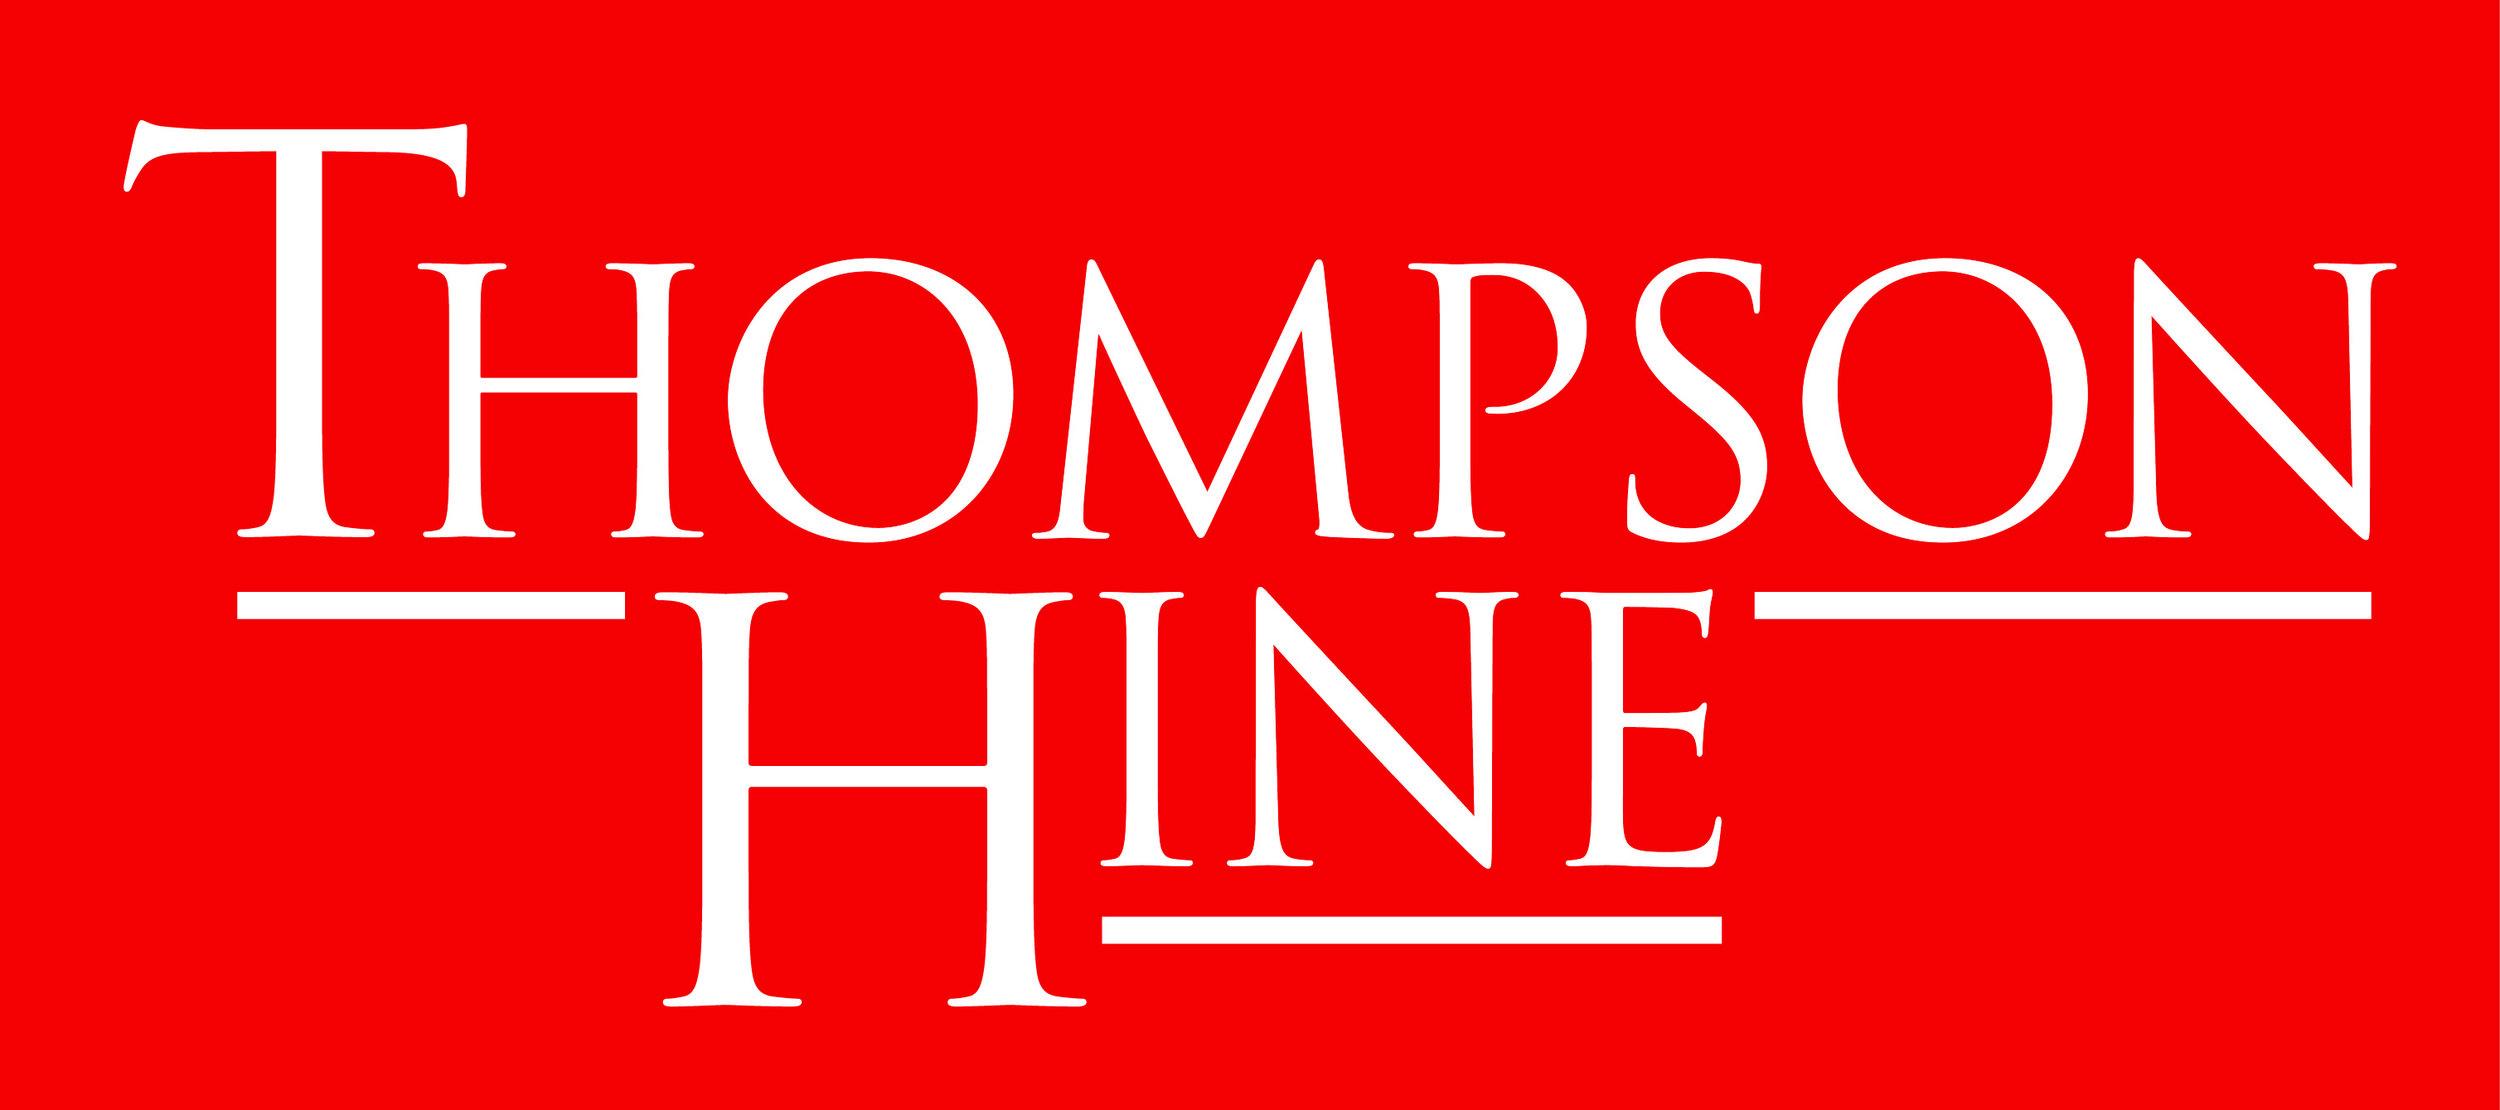 Thompsonn Hine LLP Logo.jpg